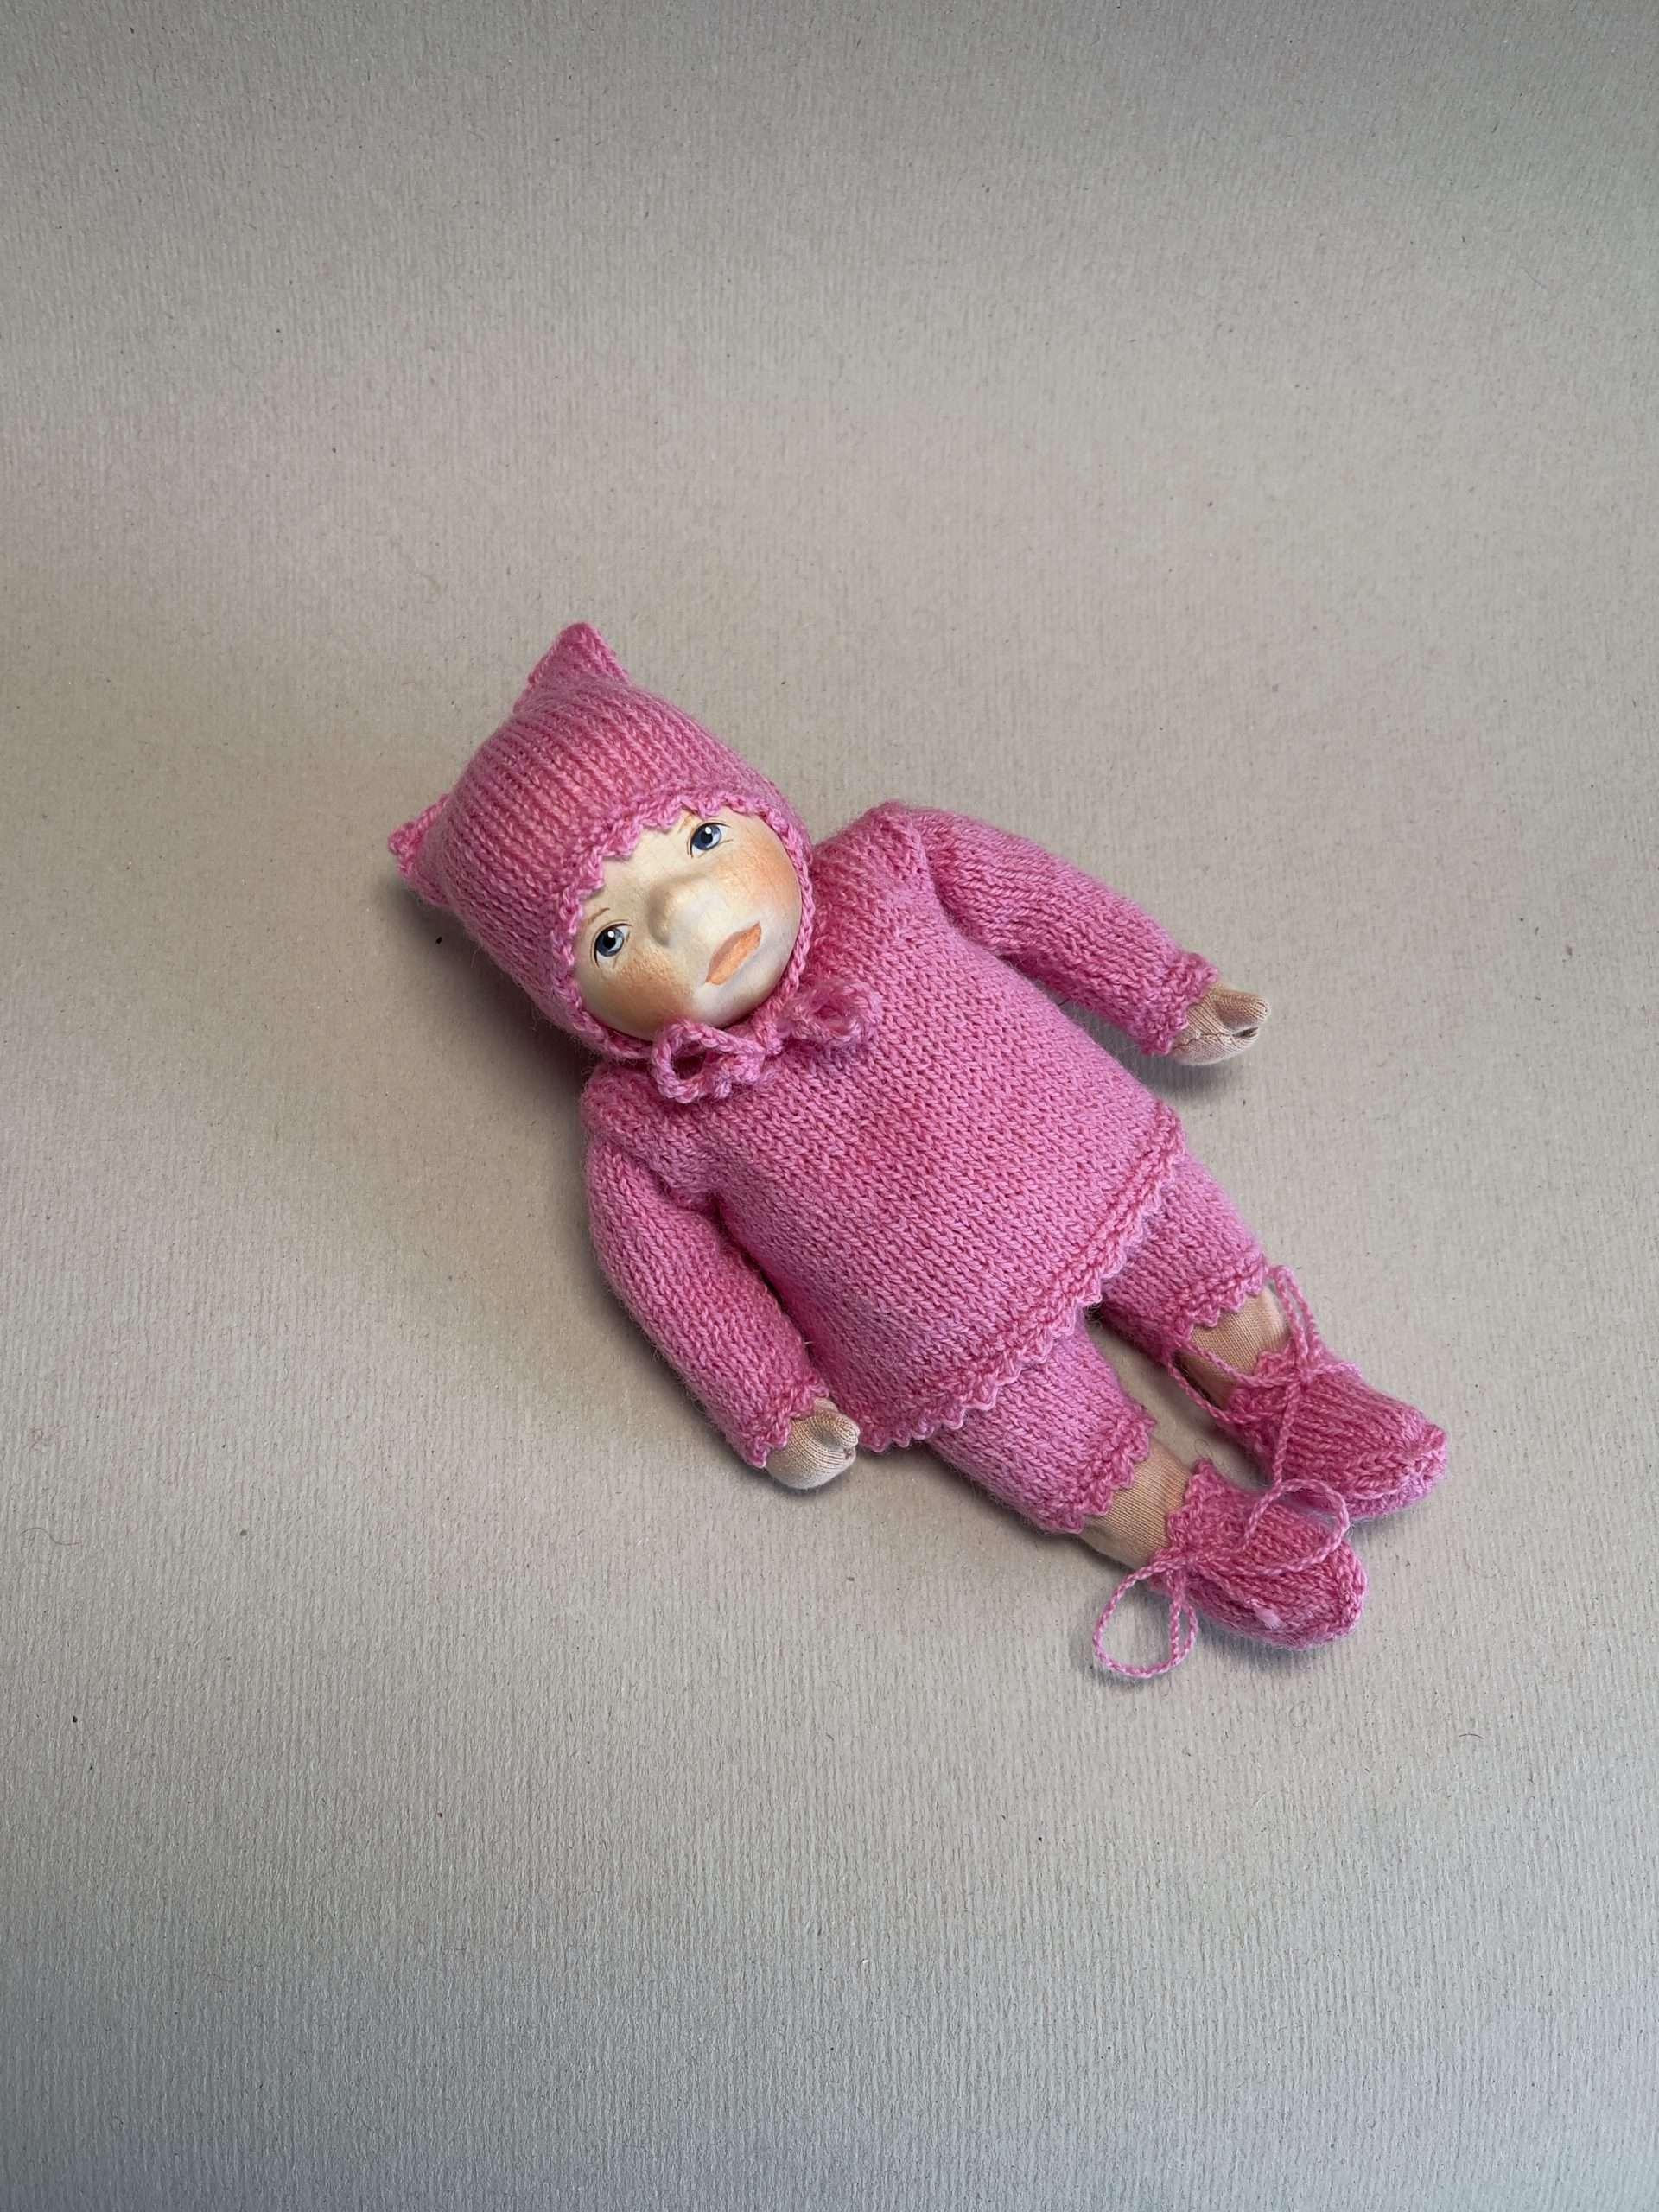 Baby Doll K048